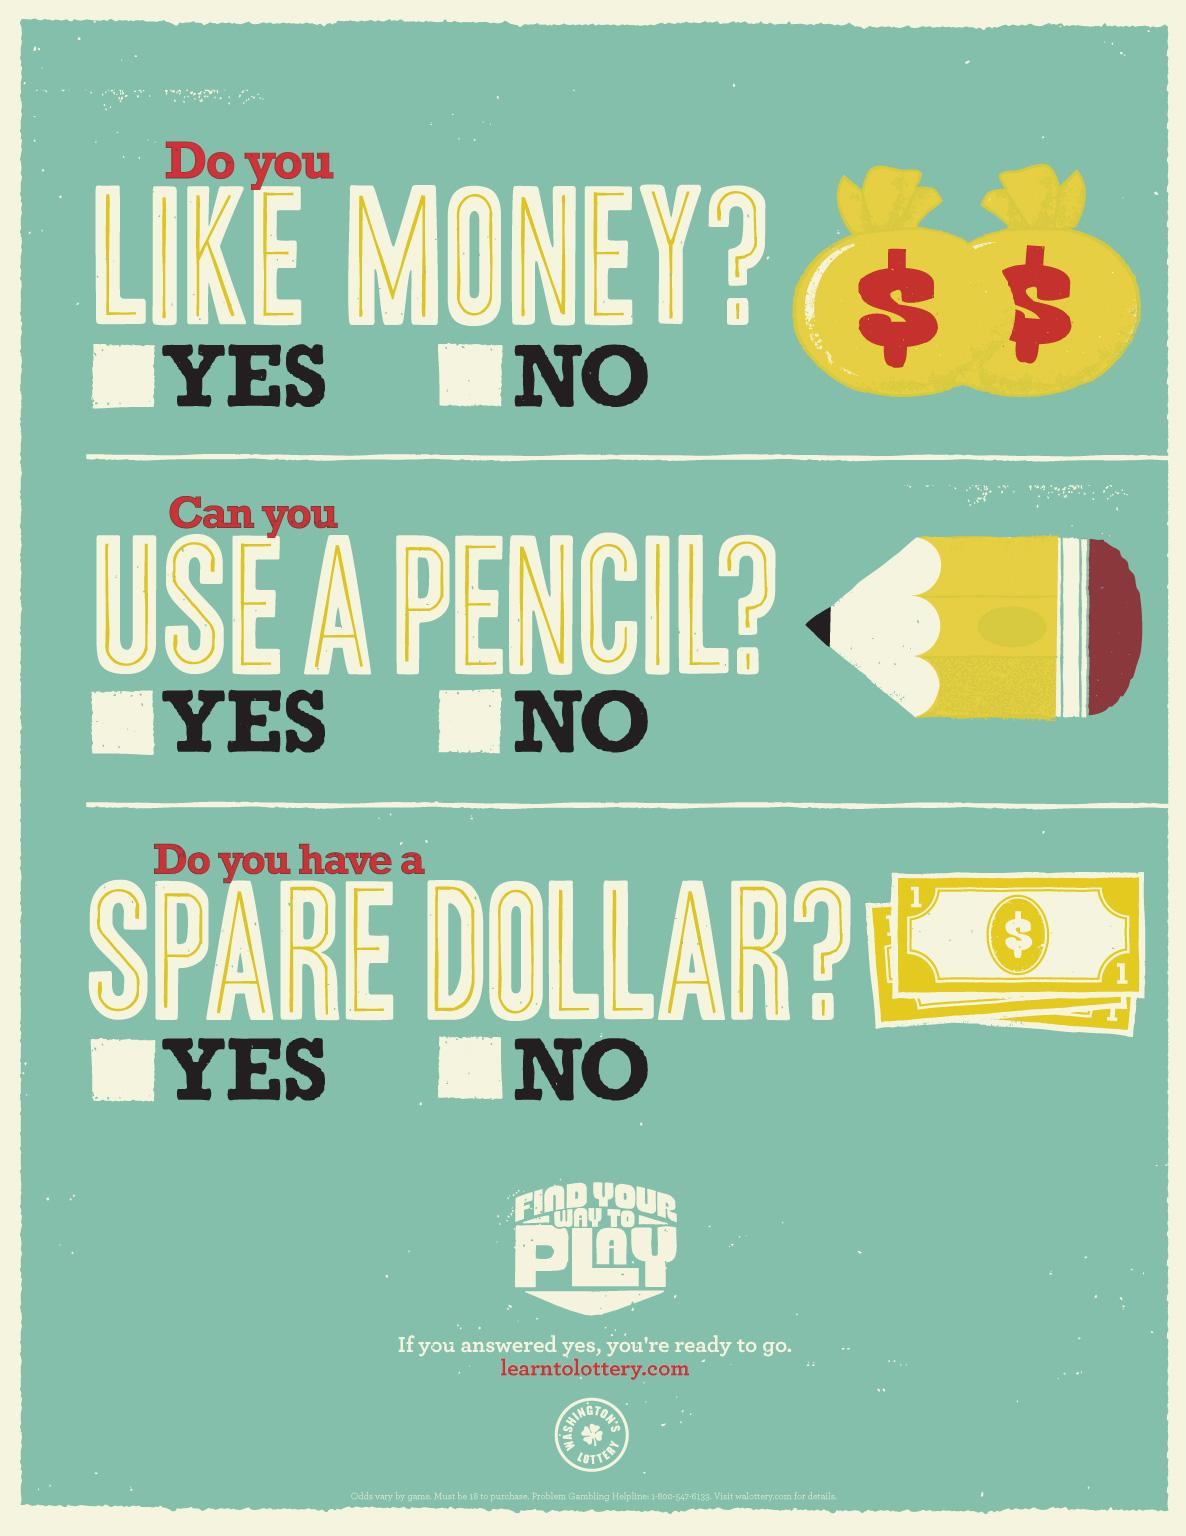 Washington Lottery Outdoor Ad -  Pencil